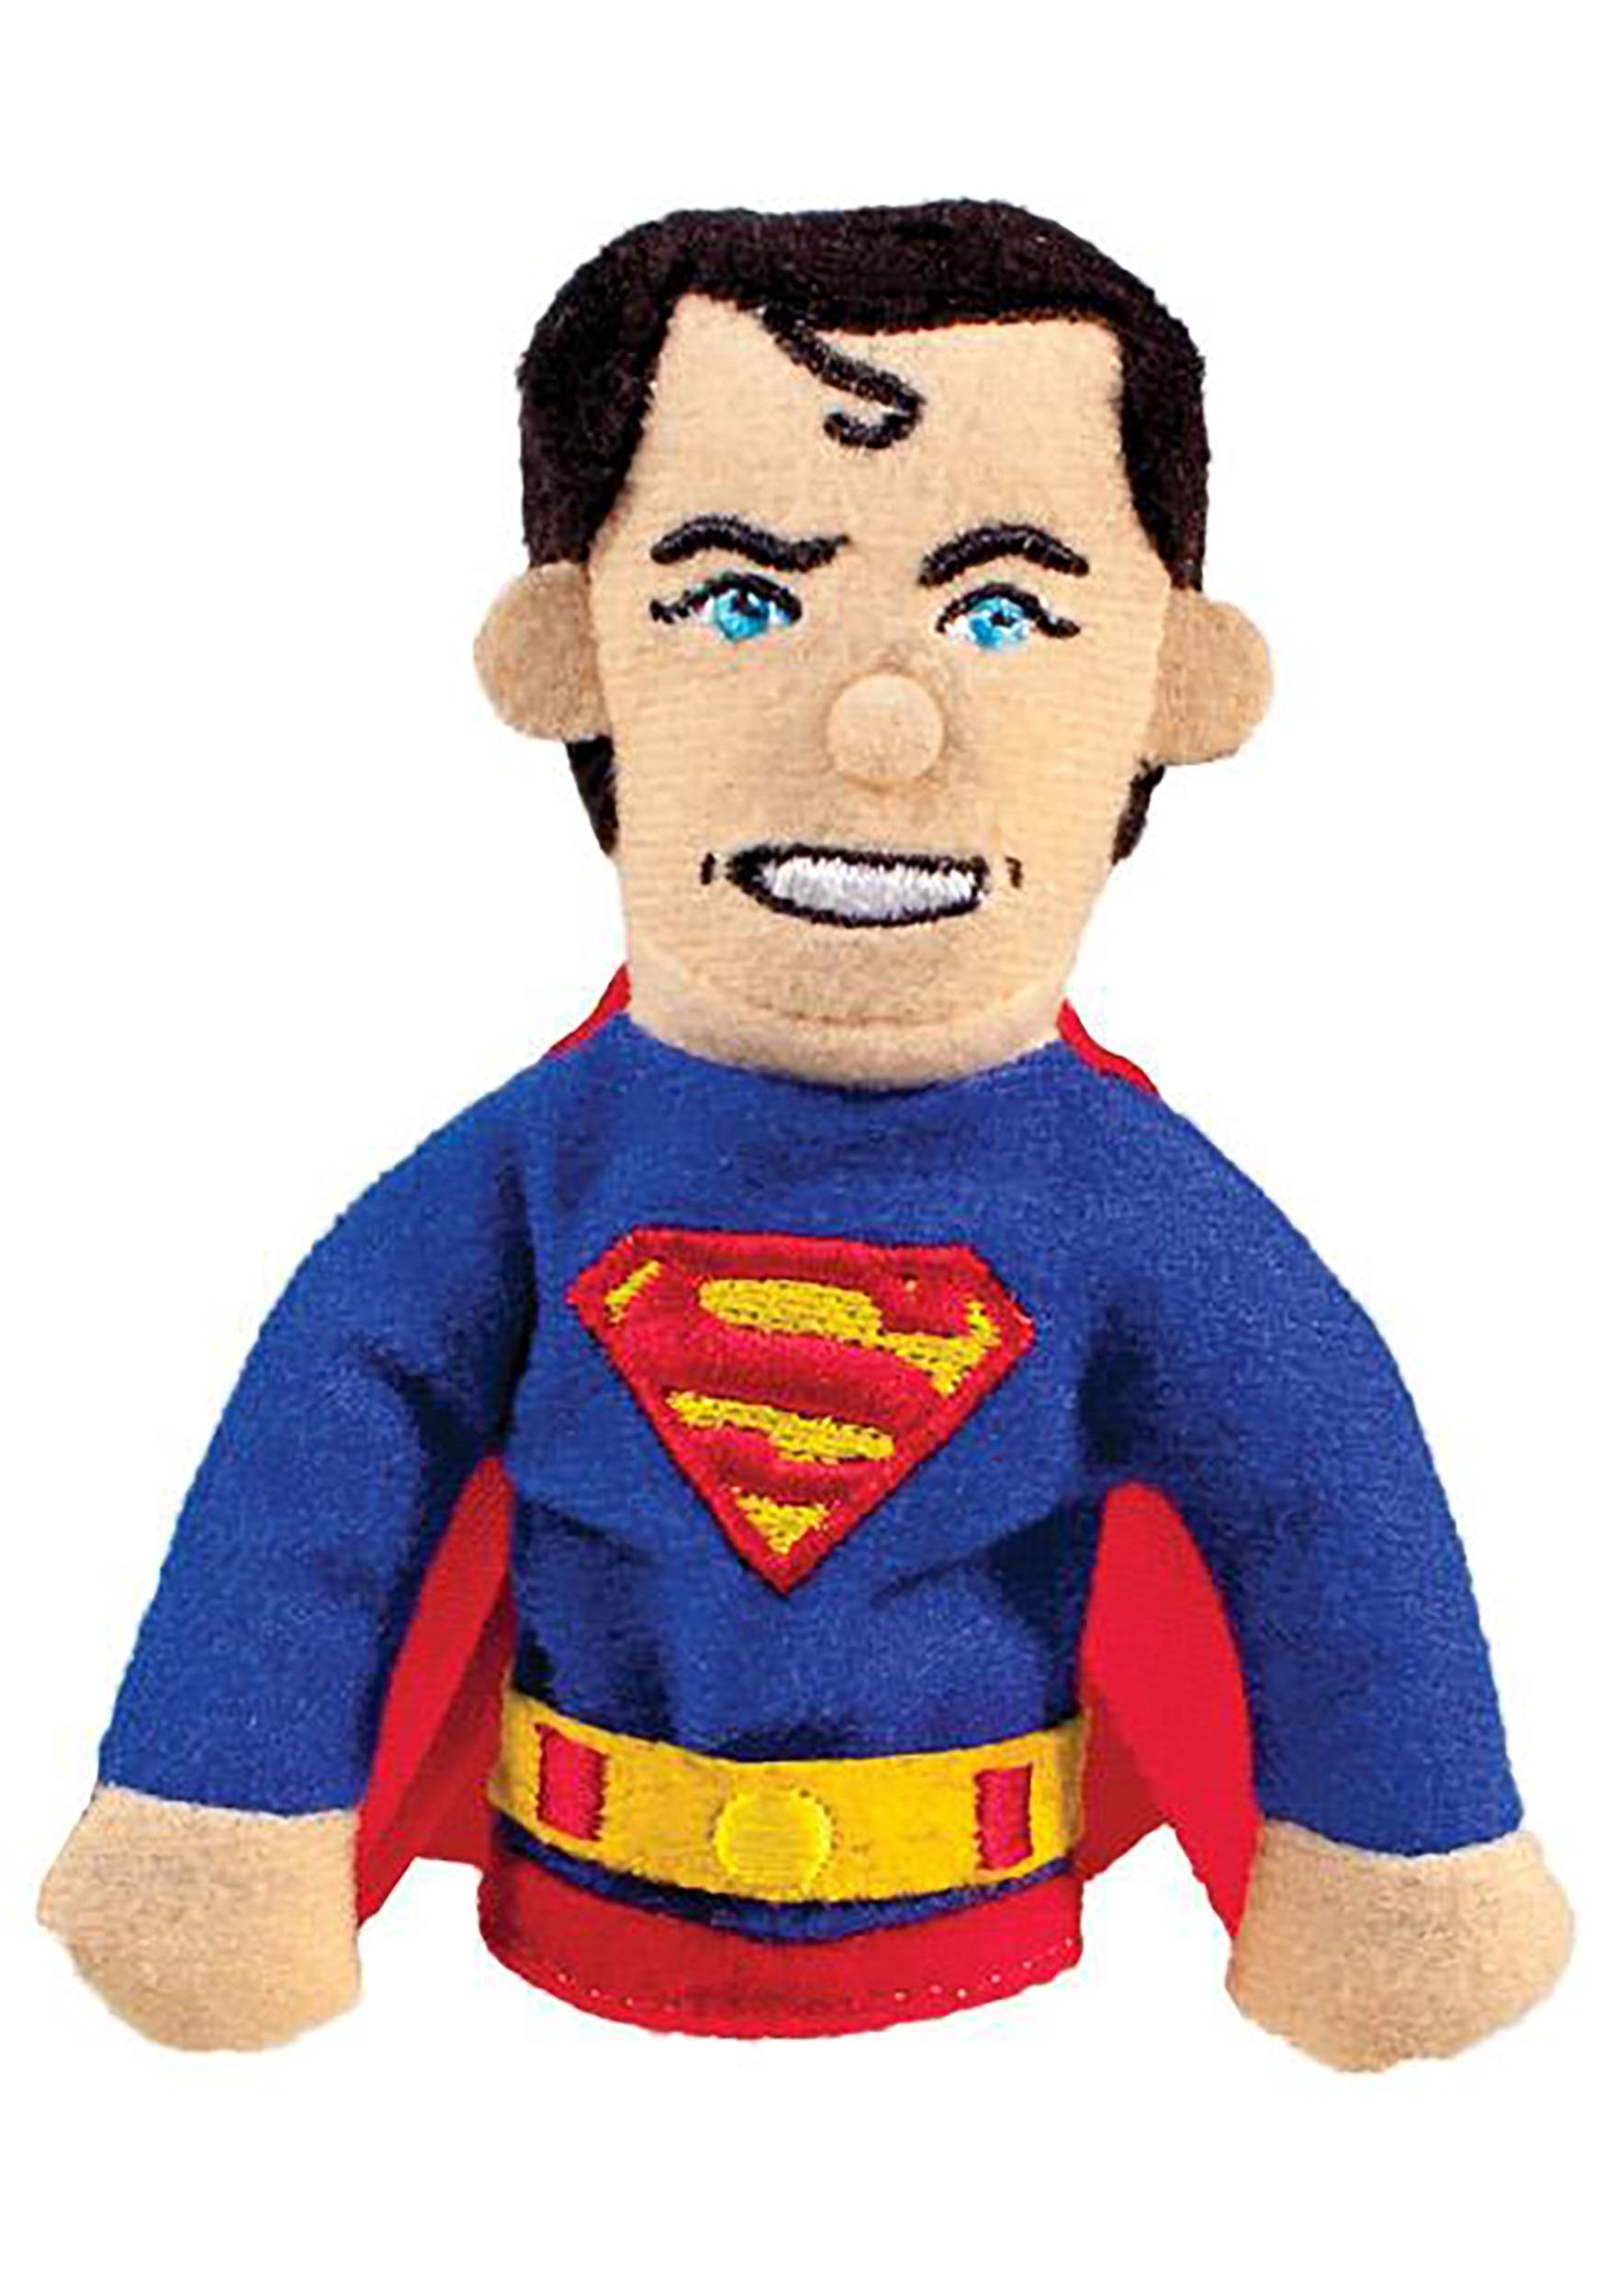 Superman Finger Puppet and Refrigerator Magnet